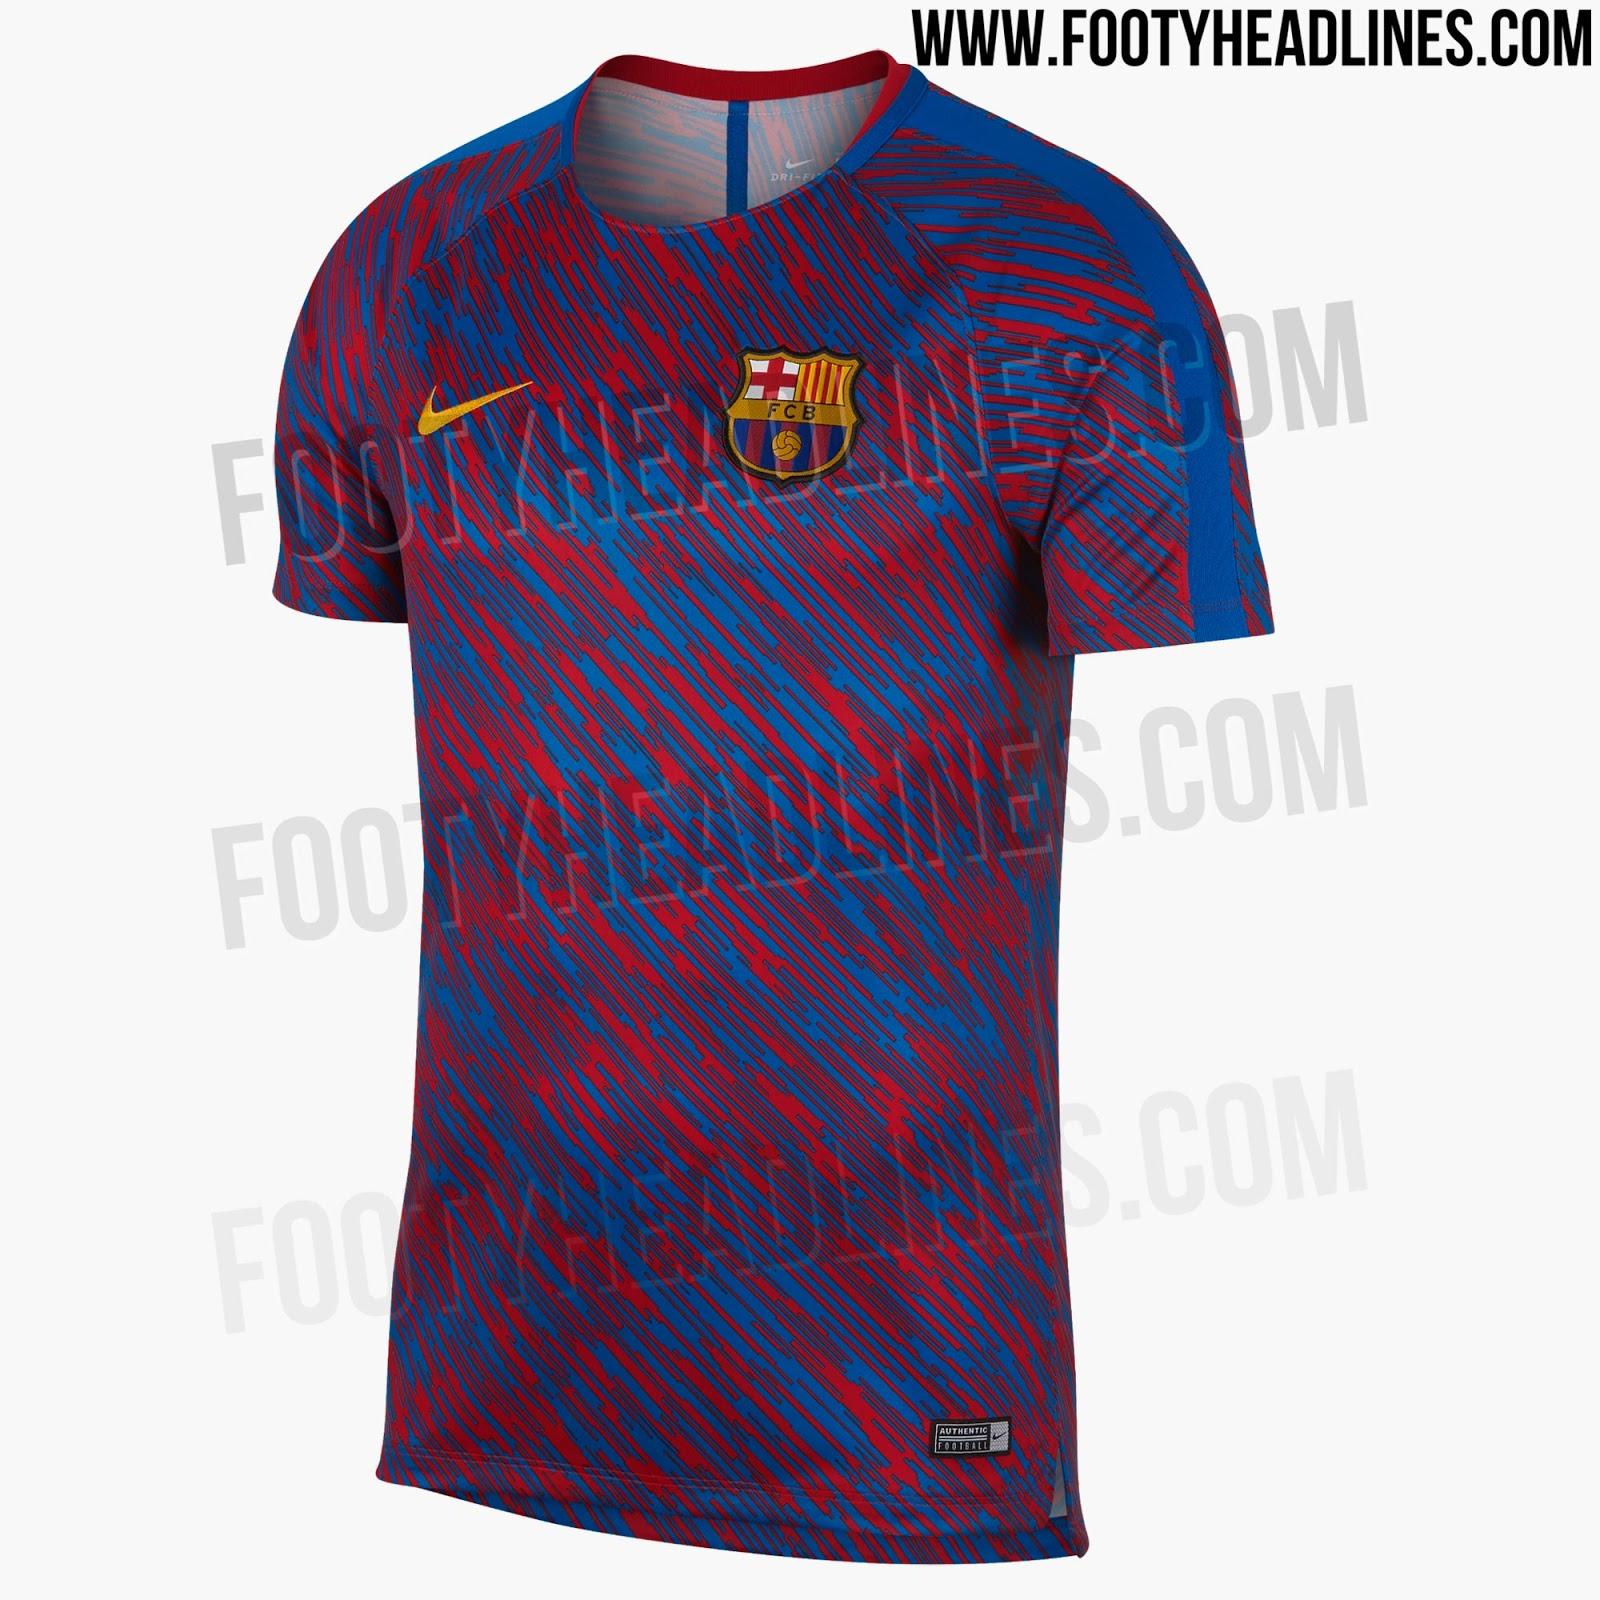 https://4.bp.blogspot.com/--Hc0sVkpKDA/Wj9IQA9GlZI/AAAAAAABa3I/P5AALUV1bsIL_q02p6to7IAl2guNV67-gCLcBGAs/s1600/nike-fc-barcelona-2018-pre-match-shirt%2B%25282%2529.jpg